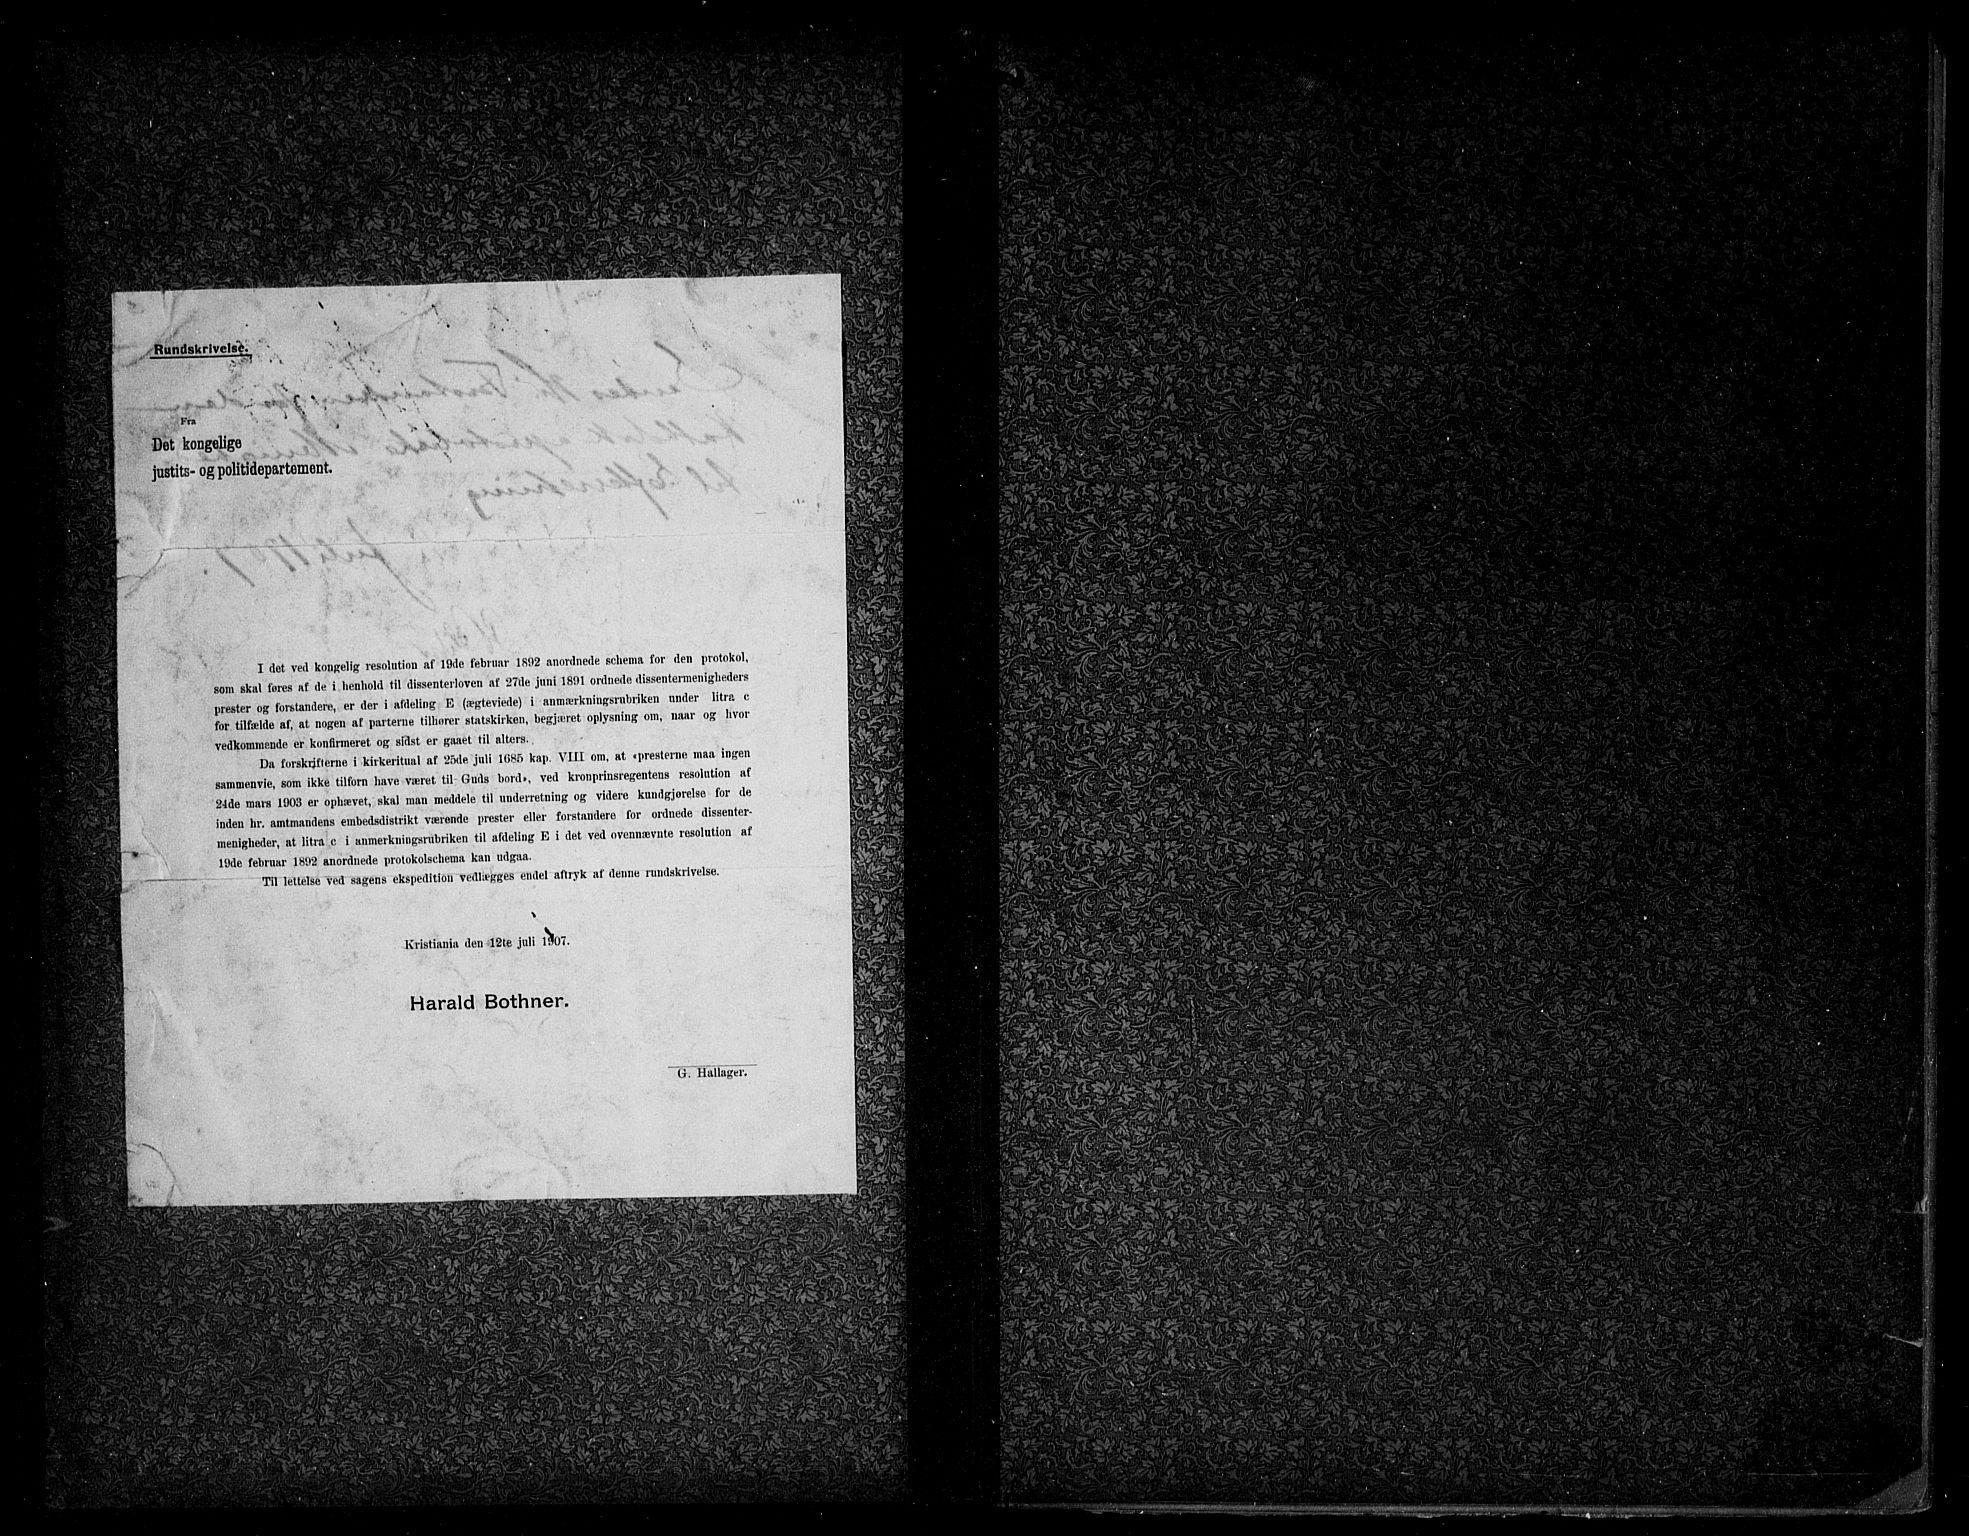 SAO, Den katolsk apostoliske menighet i Oslo , F/Fa/L0002: Dissenterprotokoll nr. 2, 1892-1937